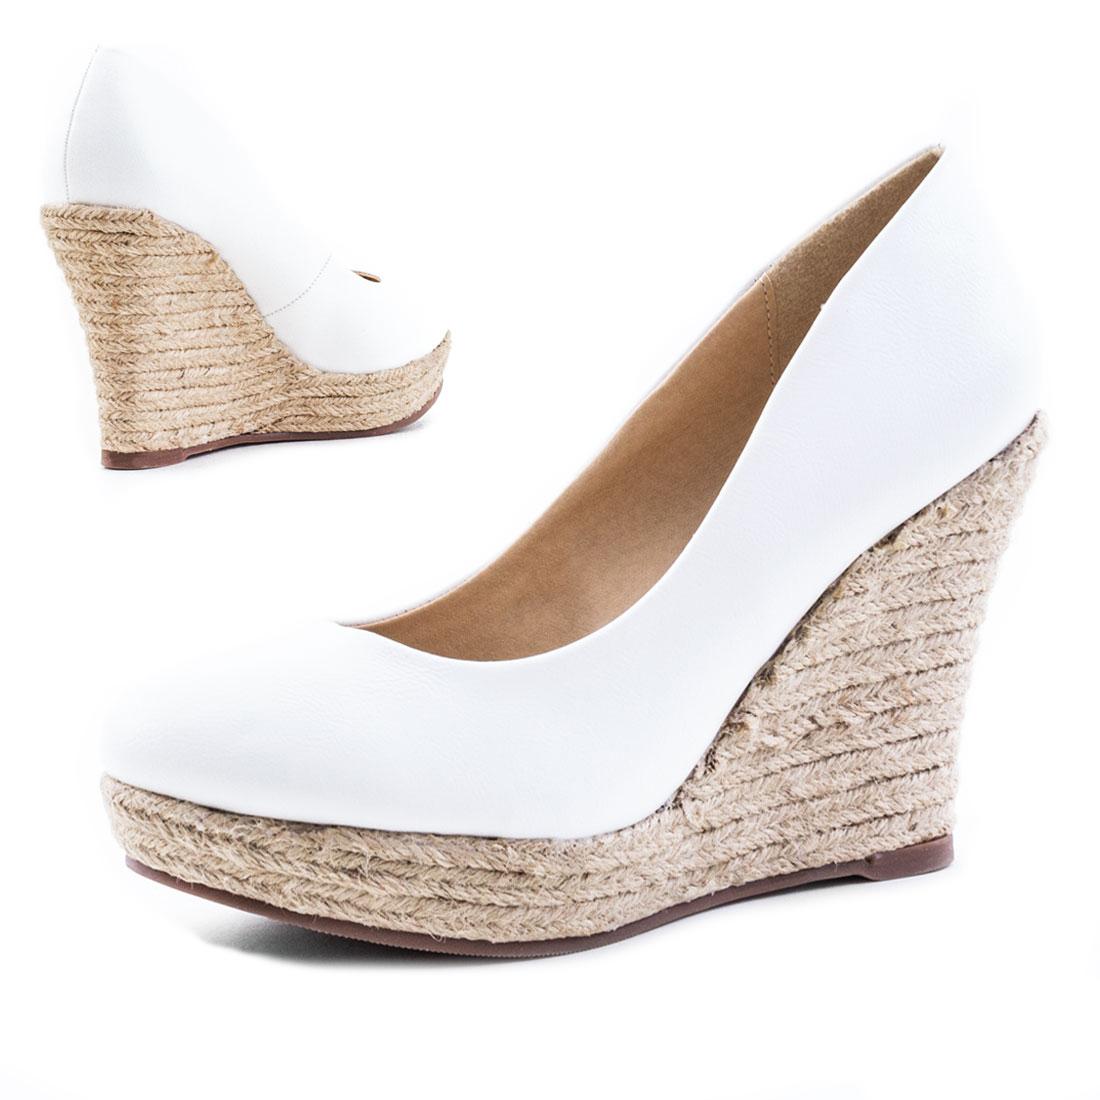 neu damen plateau keilabsatz wedges bast high heels schuhe. Black Bedroom Furniture Sets. Home Design Ideas